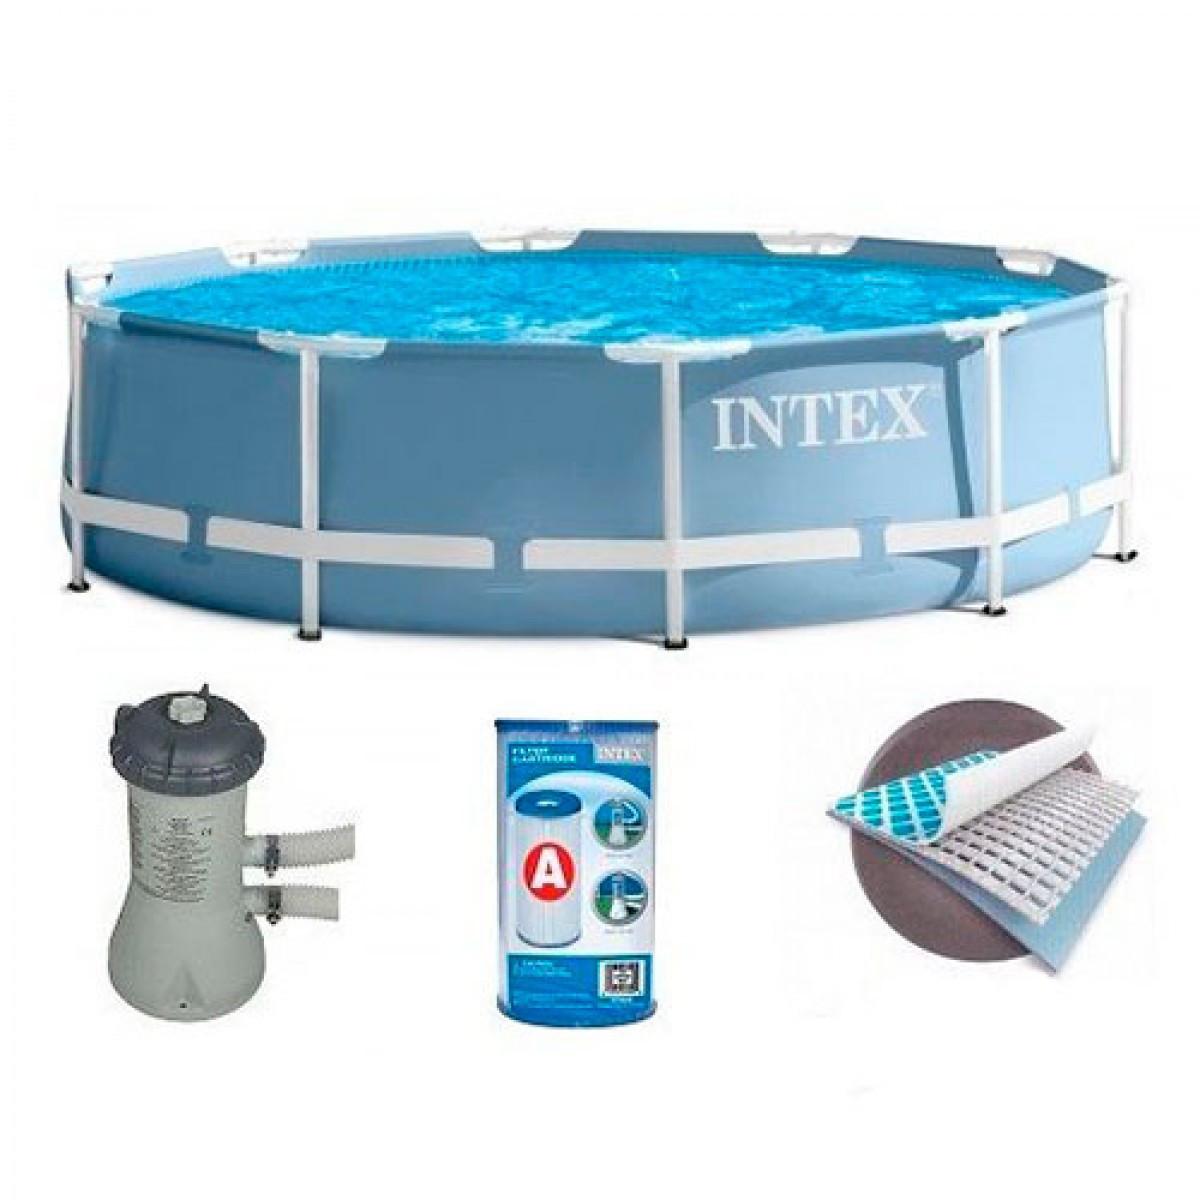 Круглый каркасный бассейн Intex Metal Frame Pool + фильтрующий насос, 366х76 см (28712)